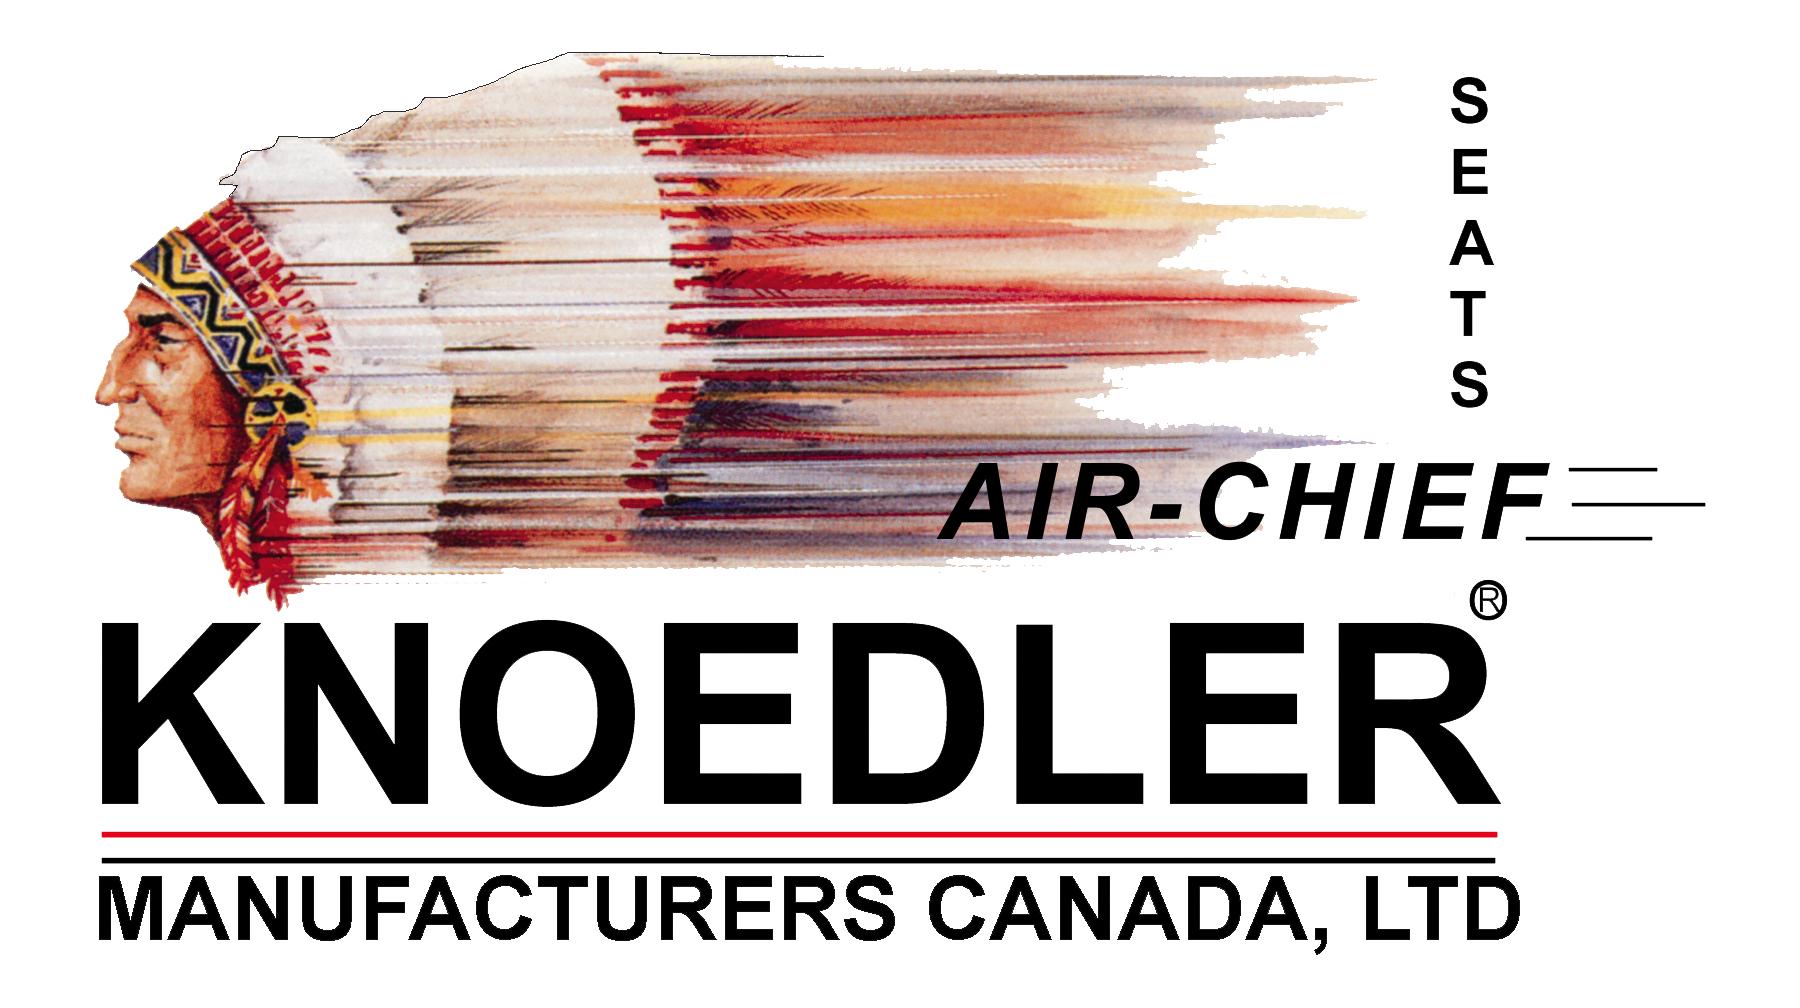 Knoedler Manufacturers